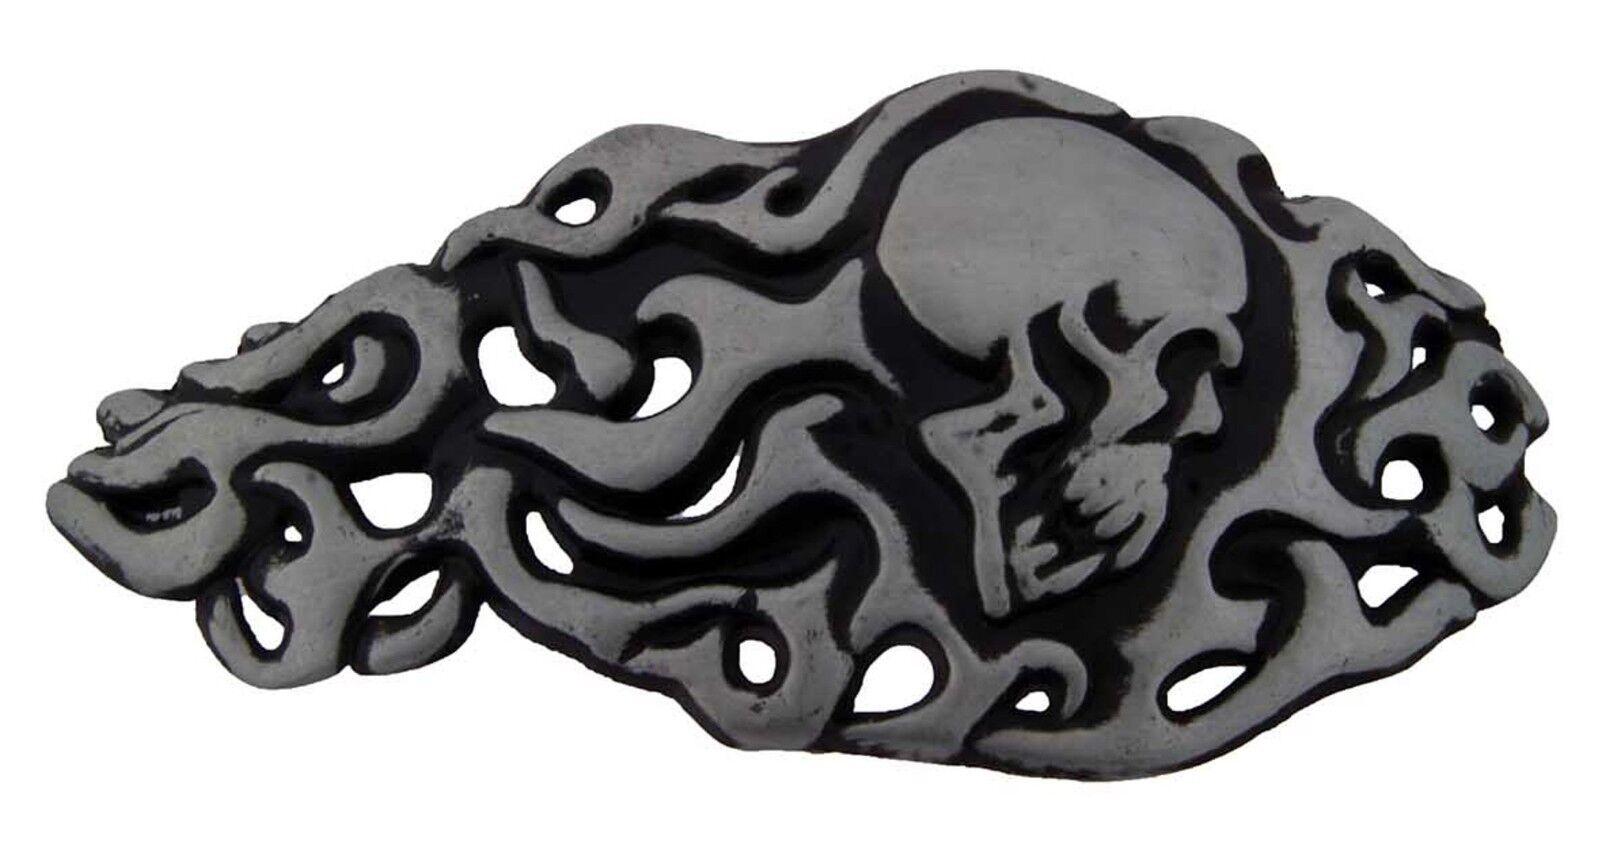 Herren Damen Totenkopf Gürtelschnalle Metall Tattoo Gothic USA Halloween Kostüm